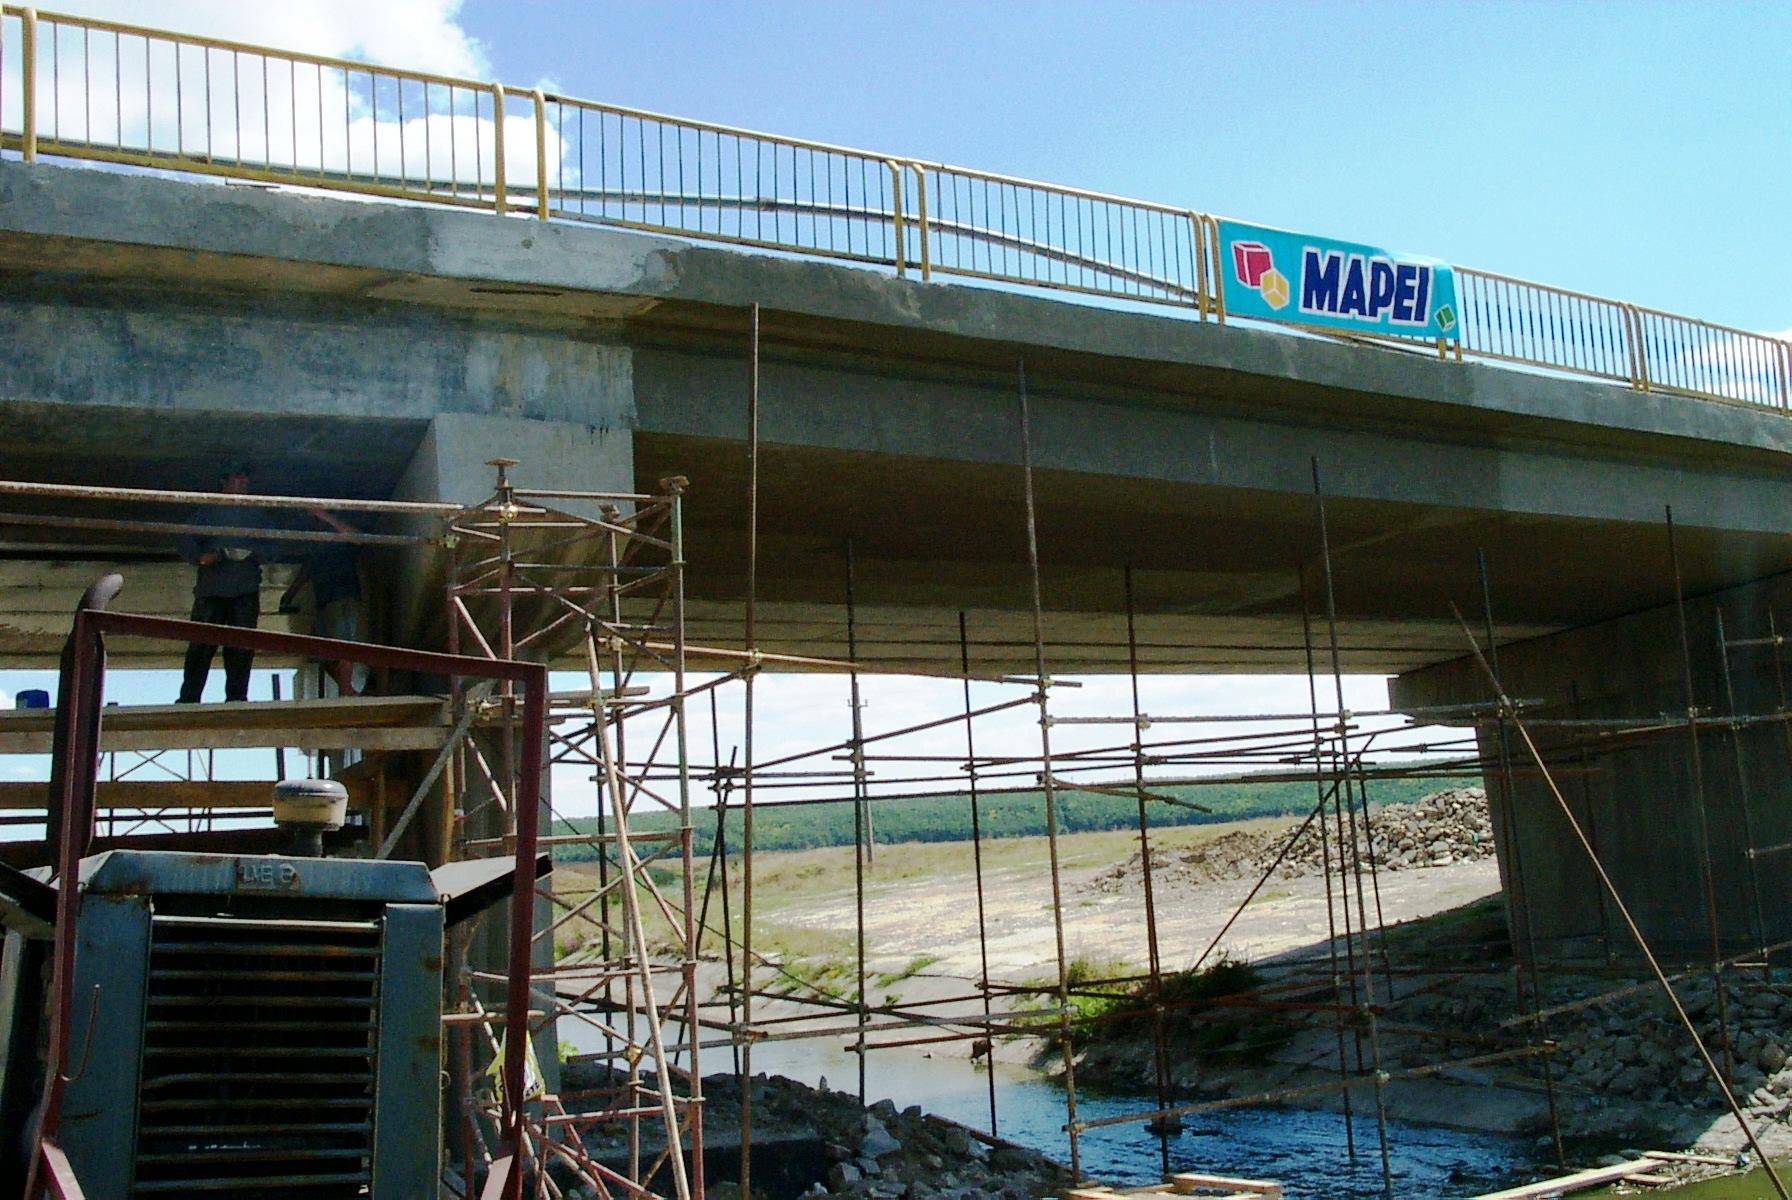 Reparatii pod (DN2), Km. 33 - 028, peste raul Calnistea MAPEI - Poza 3